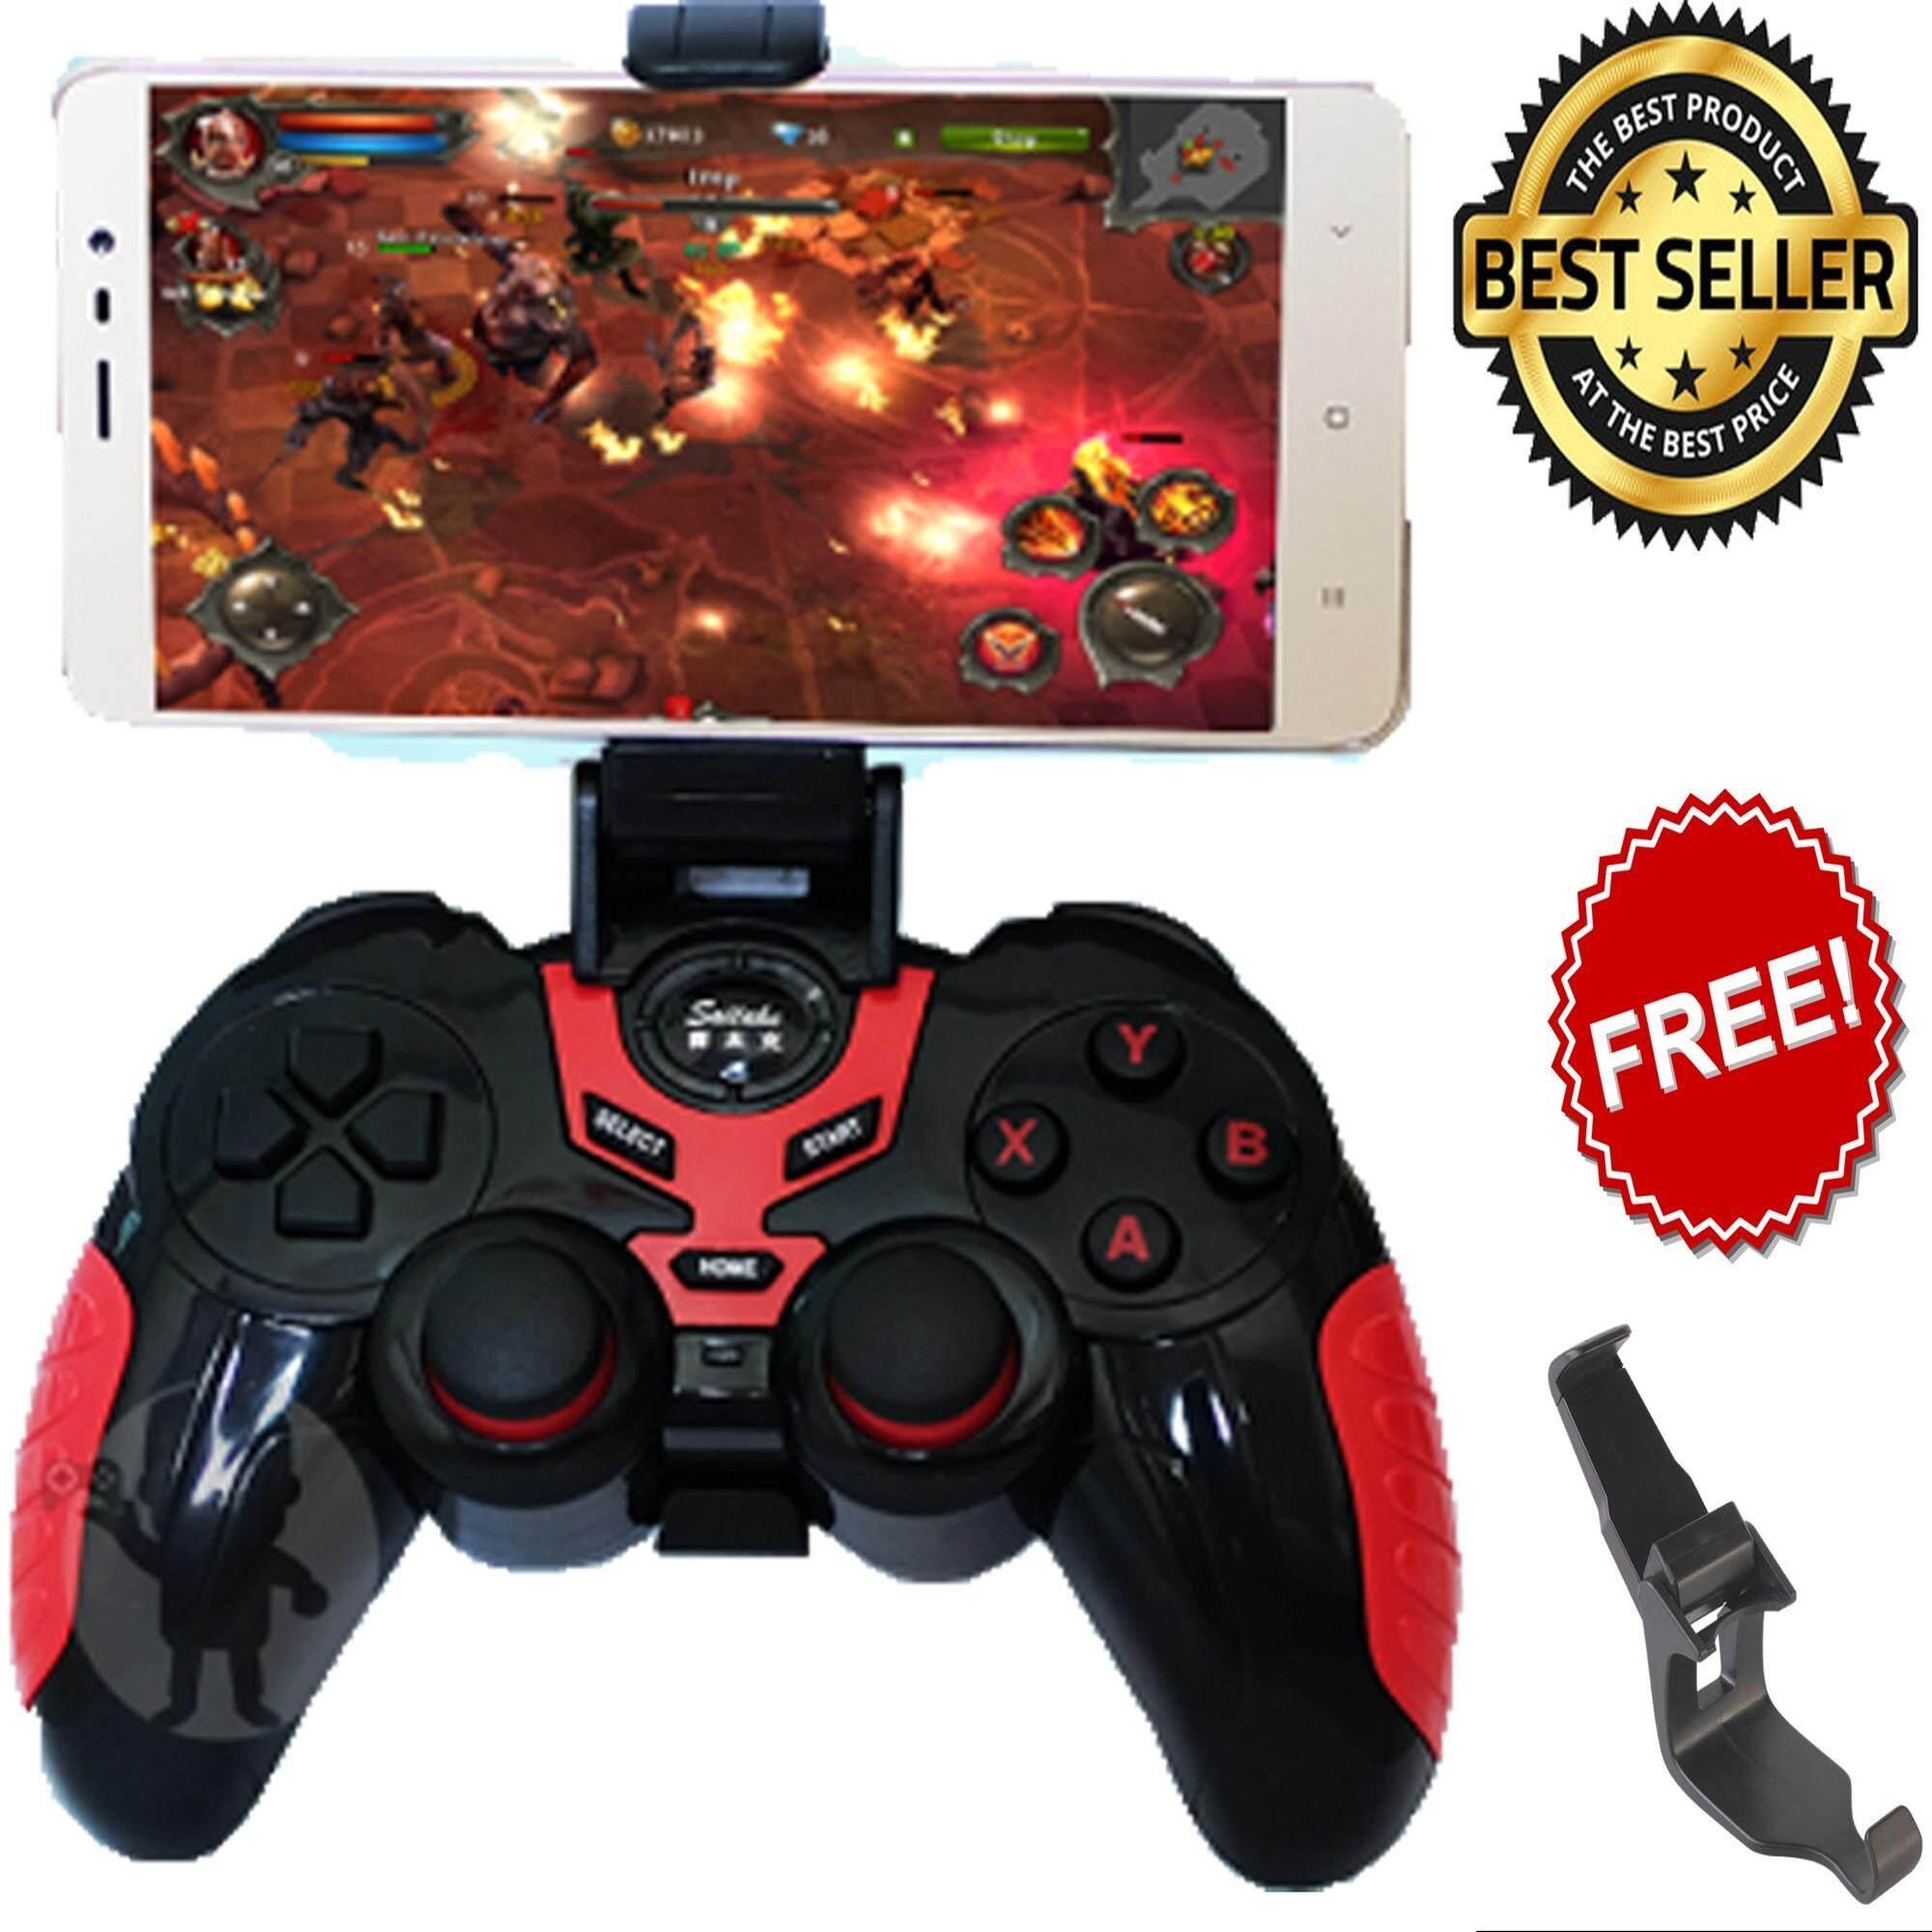 joypad  จอยเกมส์ มือถือ ระบบ bluetooth  รองรับระบบ android ทุกรุ่น